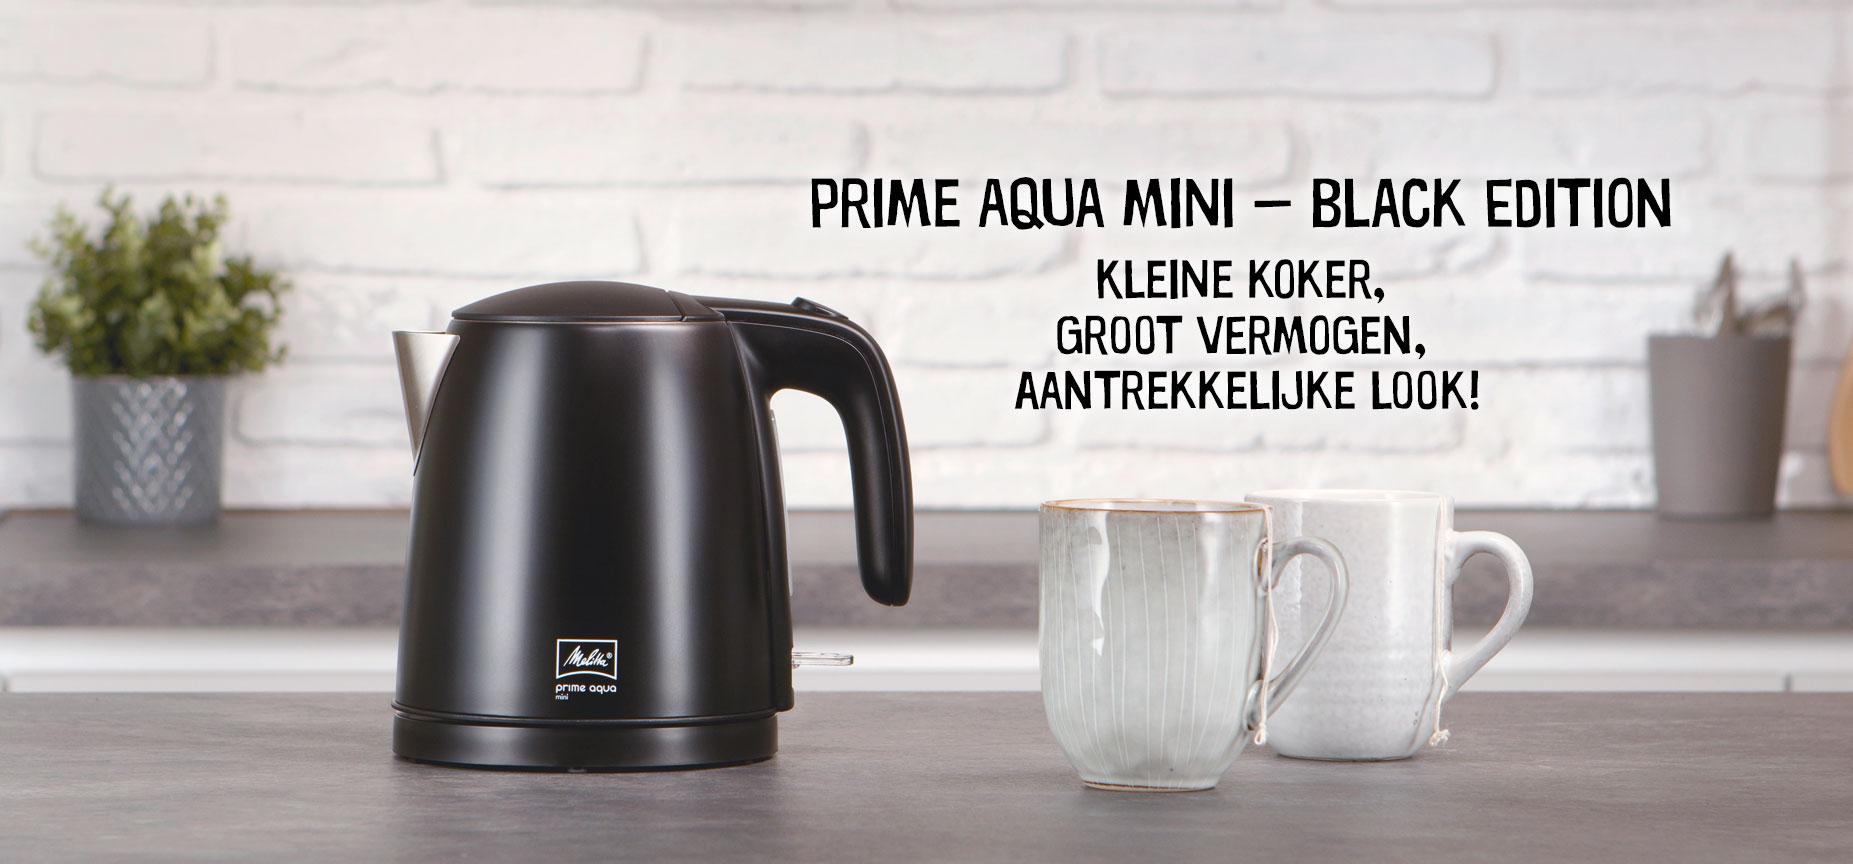 Prime Aqua mini - Black Edition